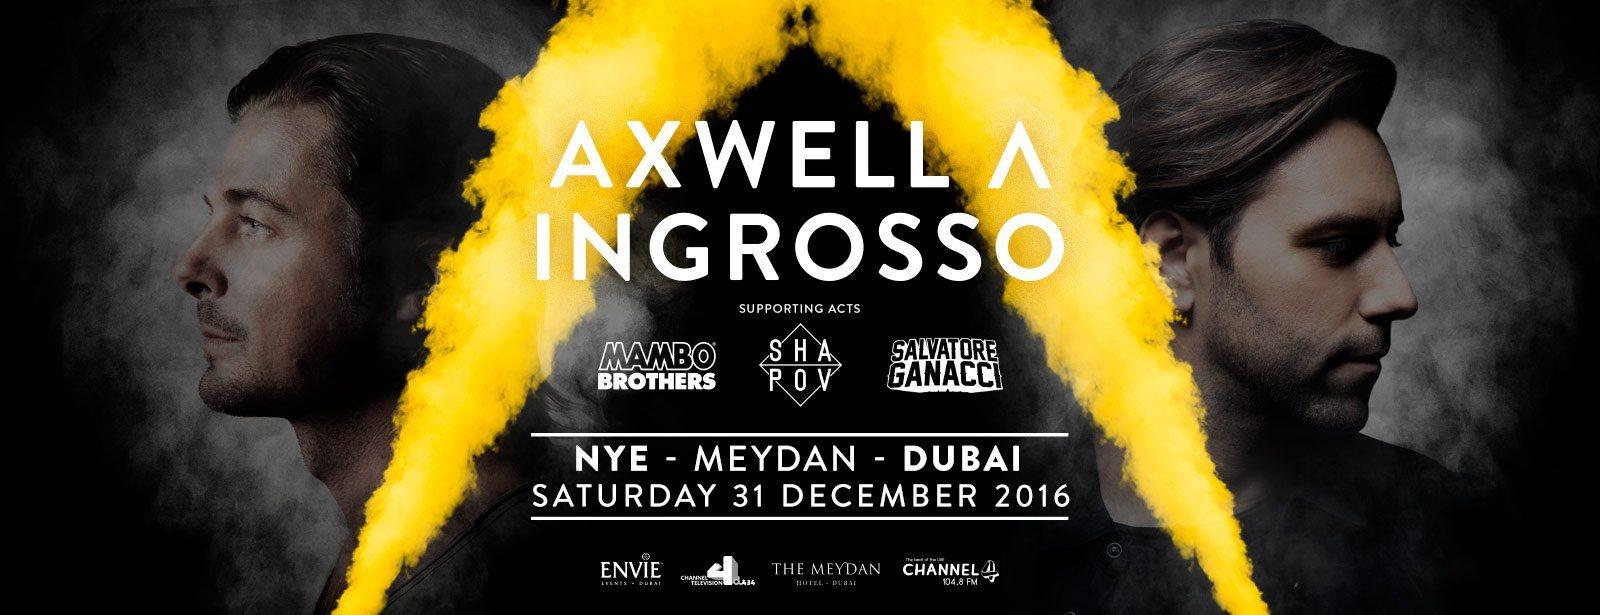 Axwell & Ingrosso concert at Meydan Dubai